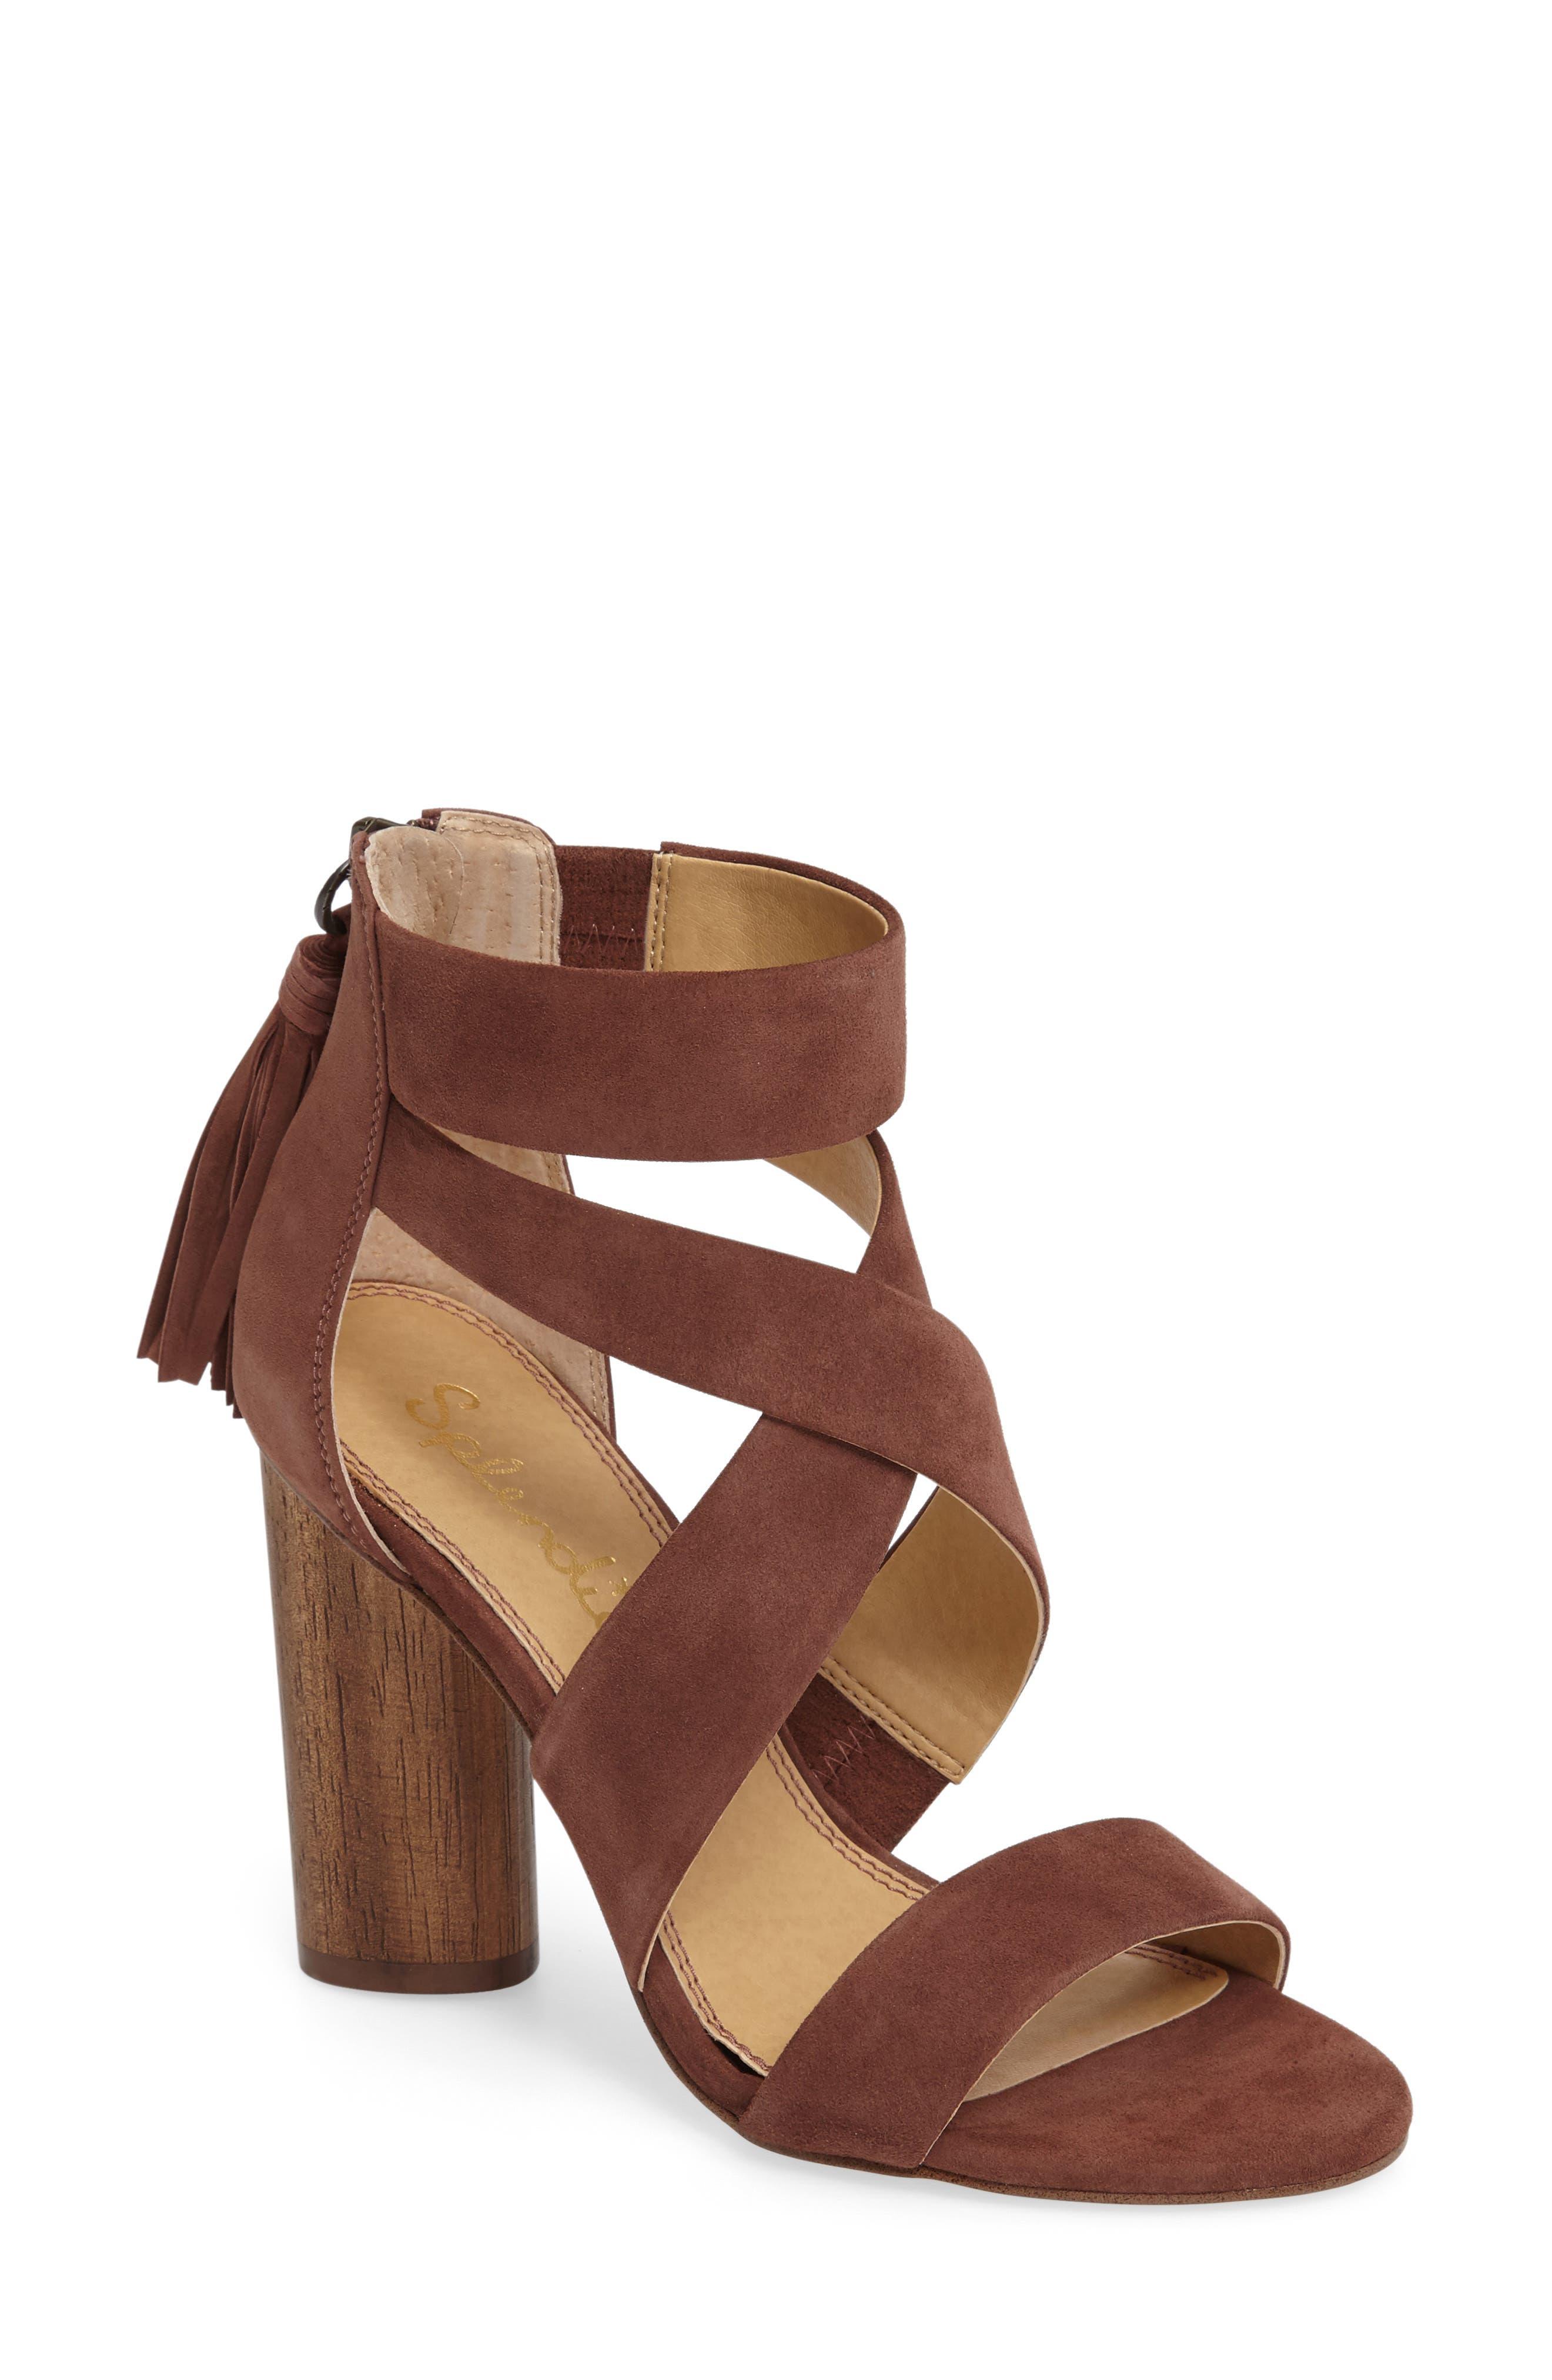 Main Image - Splendid Jara Statement Heel Sandal (Women)